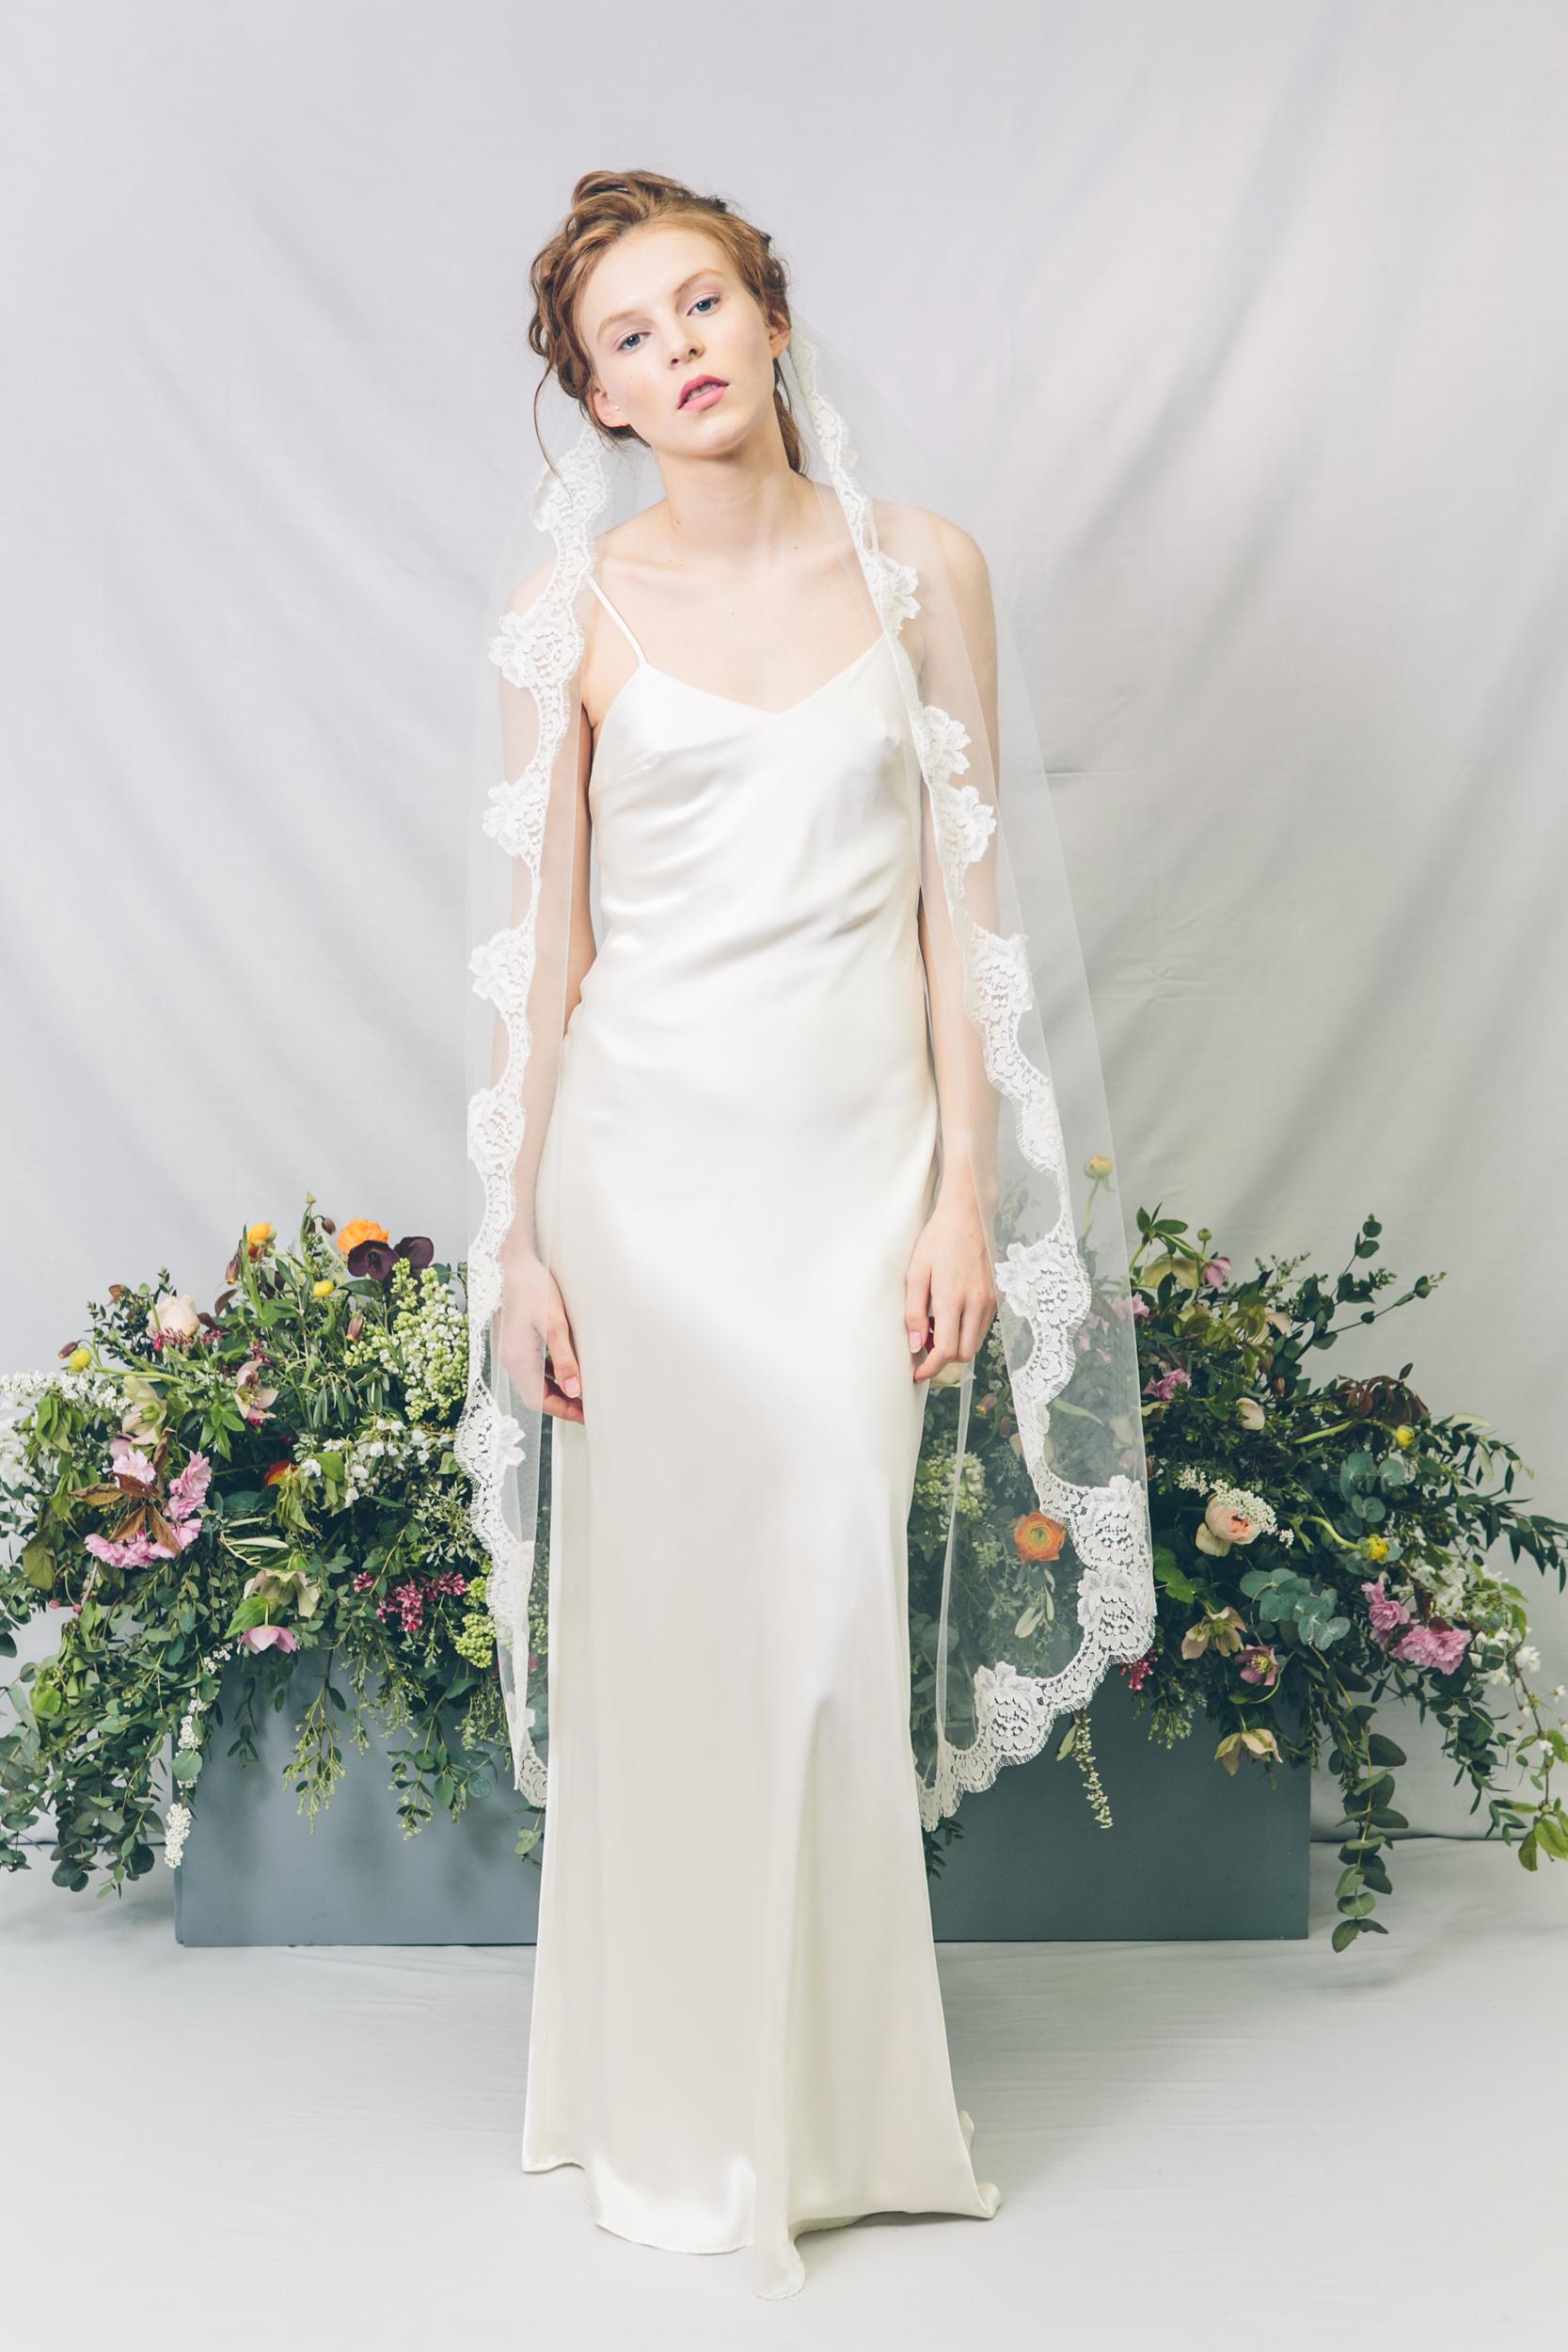 Kate-Beaumont-Wedding-Dresses-Sheffield-56.jpg